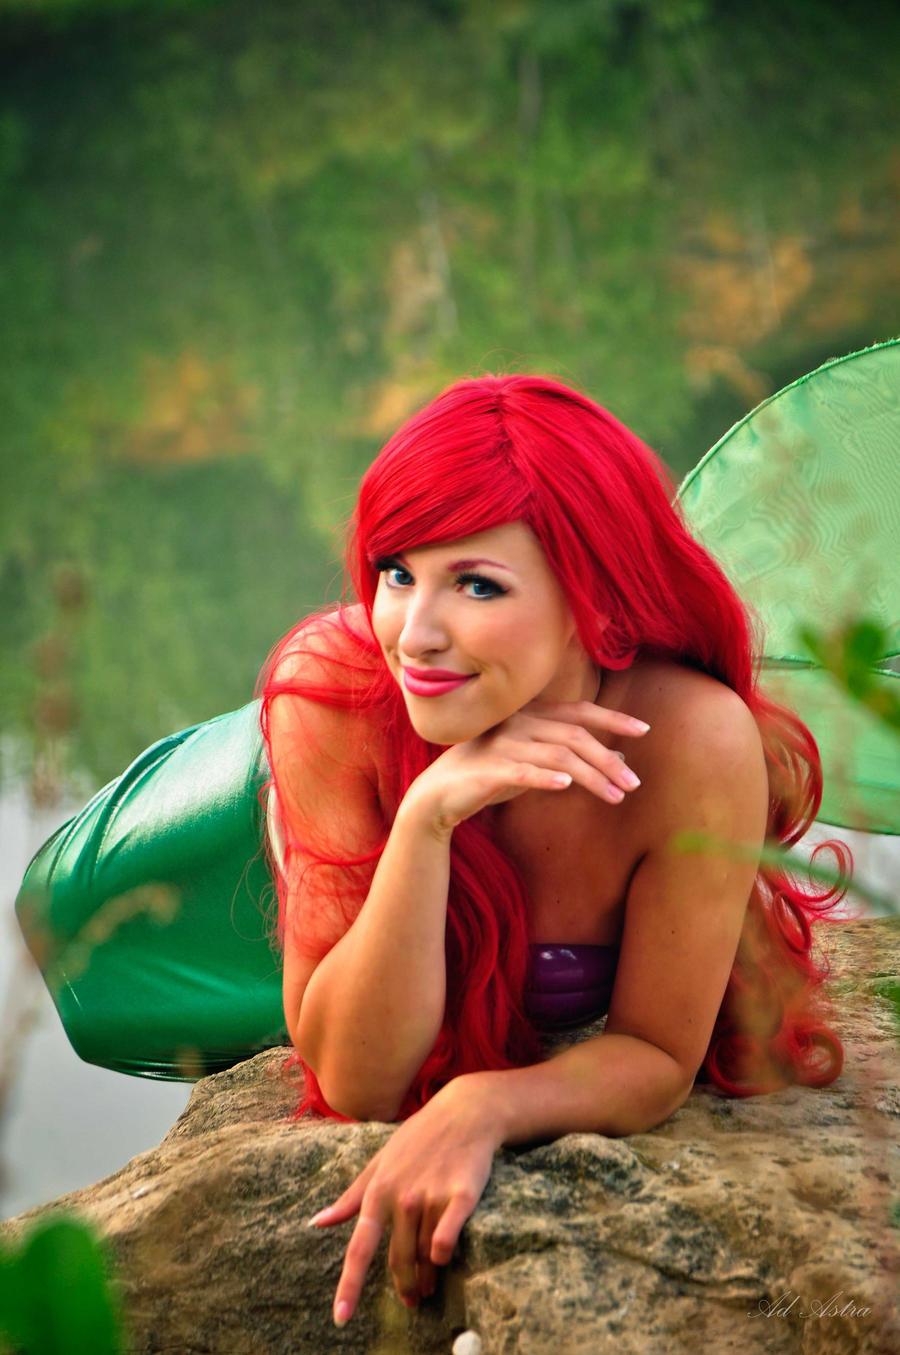 Ariel on a stone cosplay by Yana-Mio